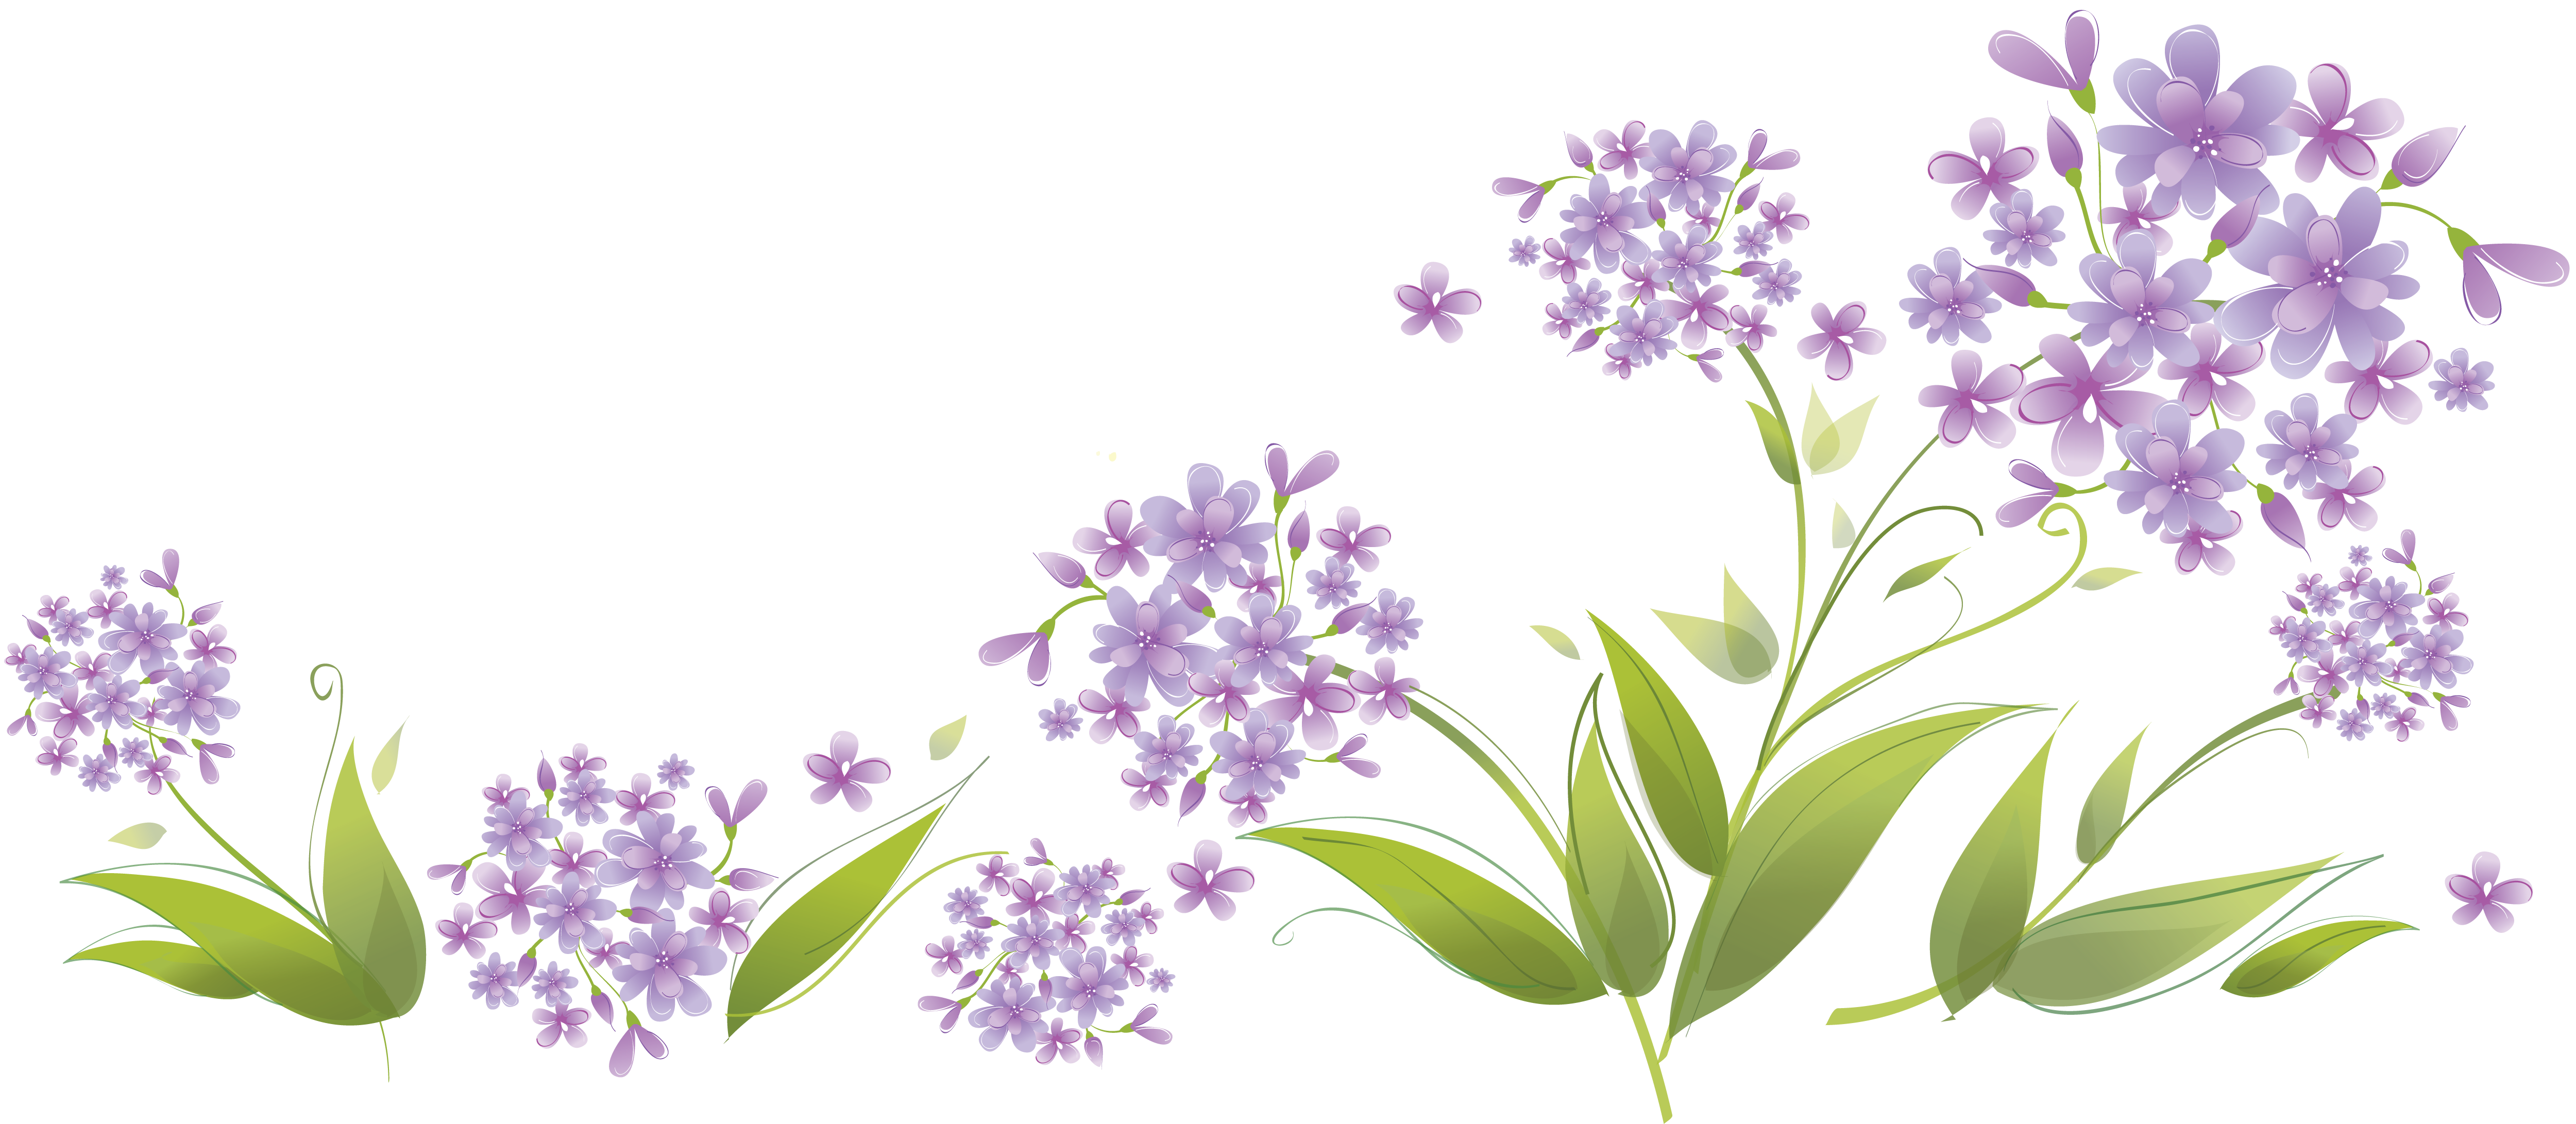 Lavender clipart botanical print. Http www lenagold ru